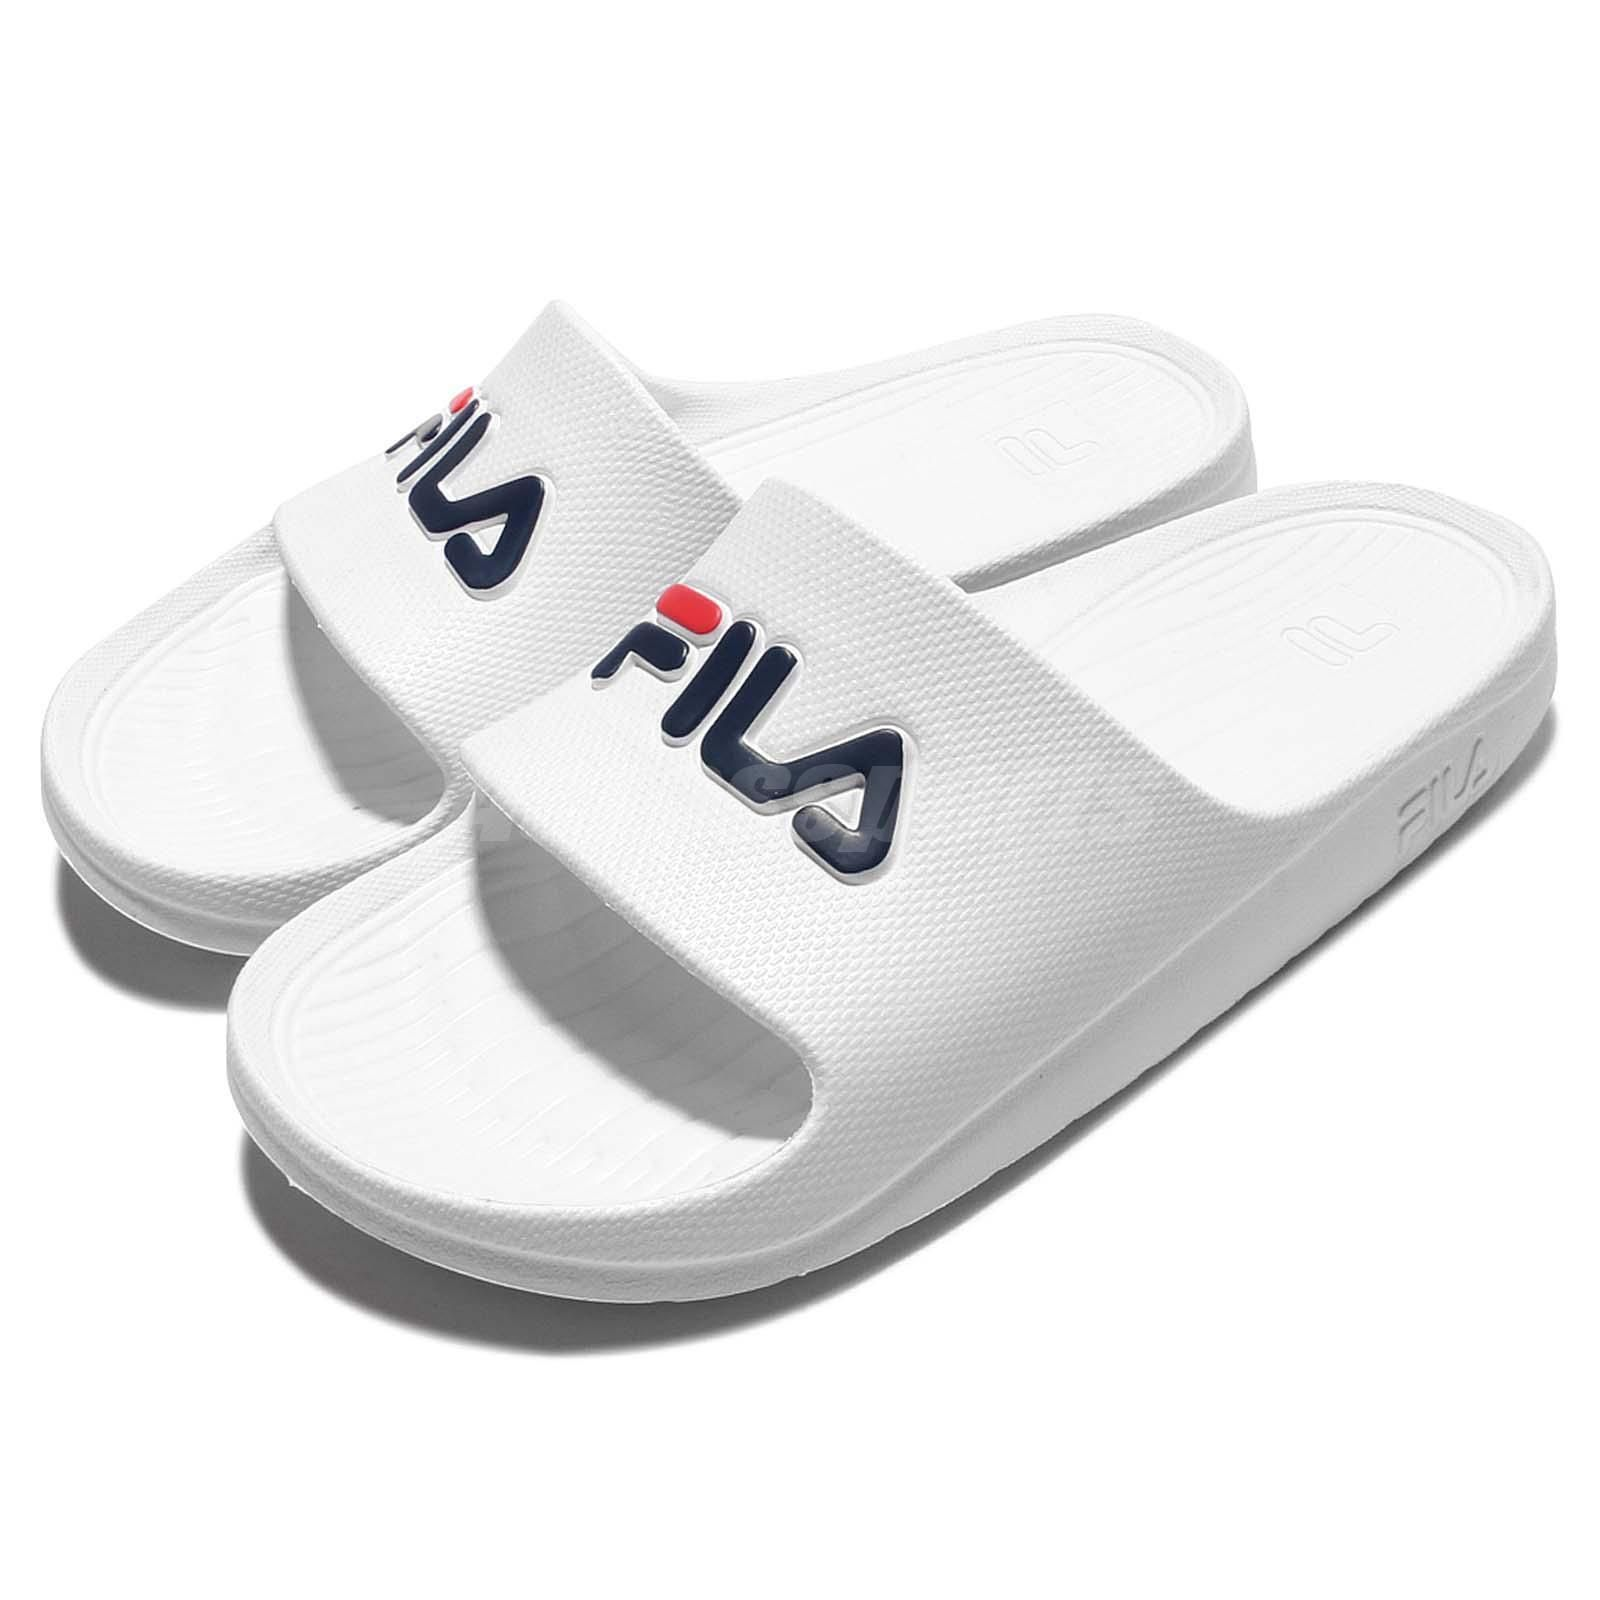 FILA Sandals \u0026 Flip Flops #ebay